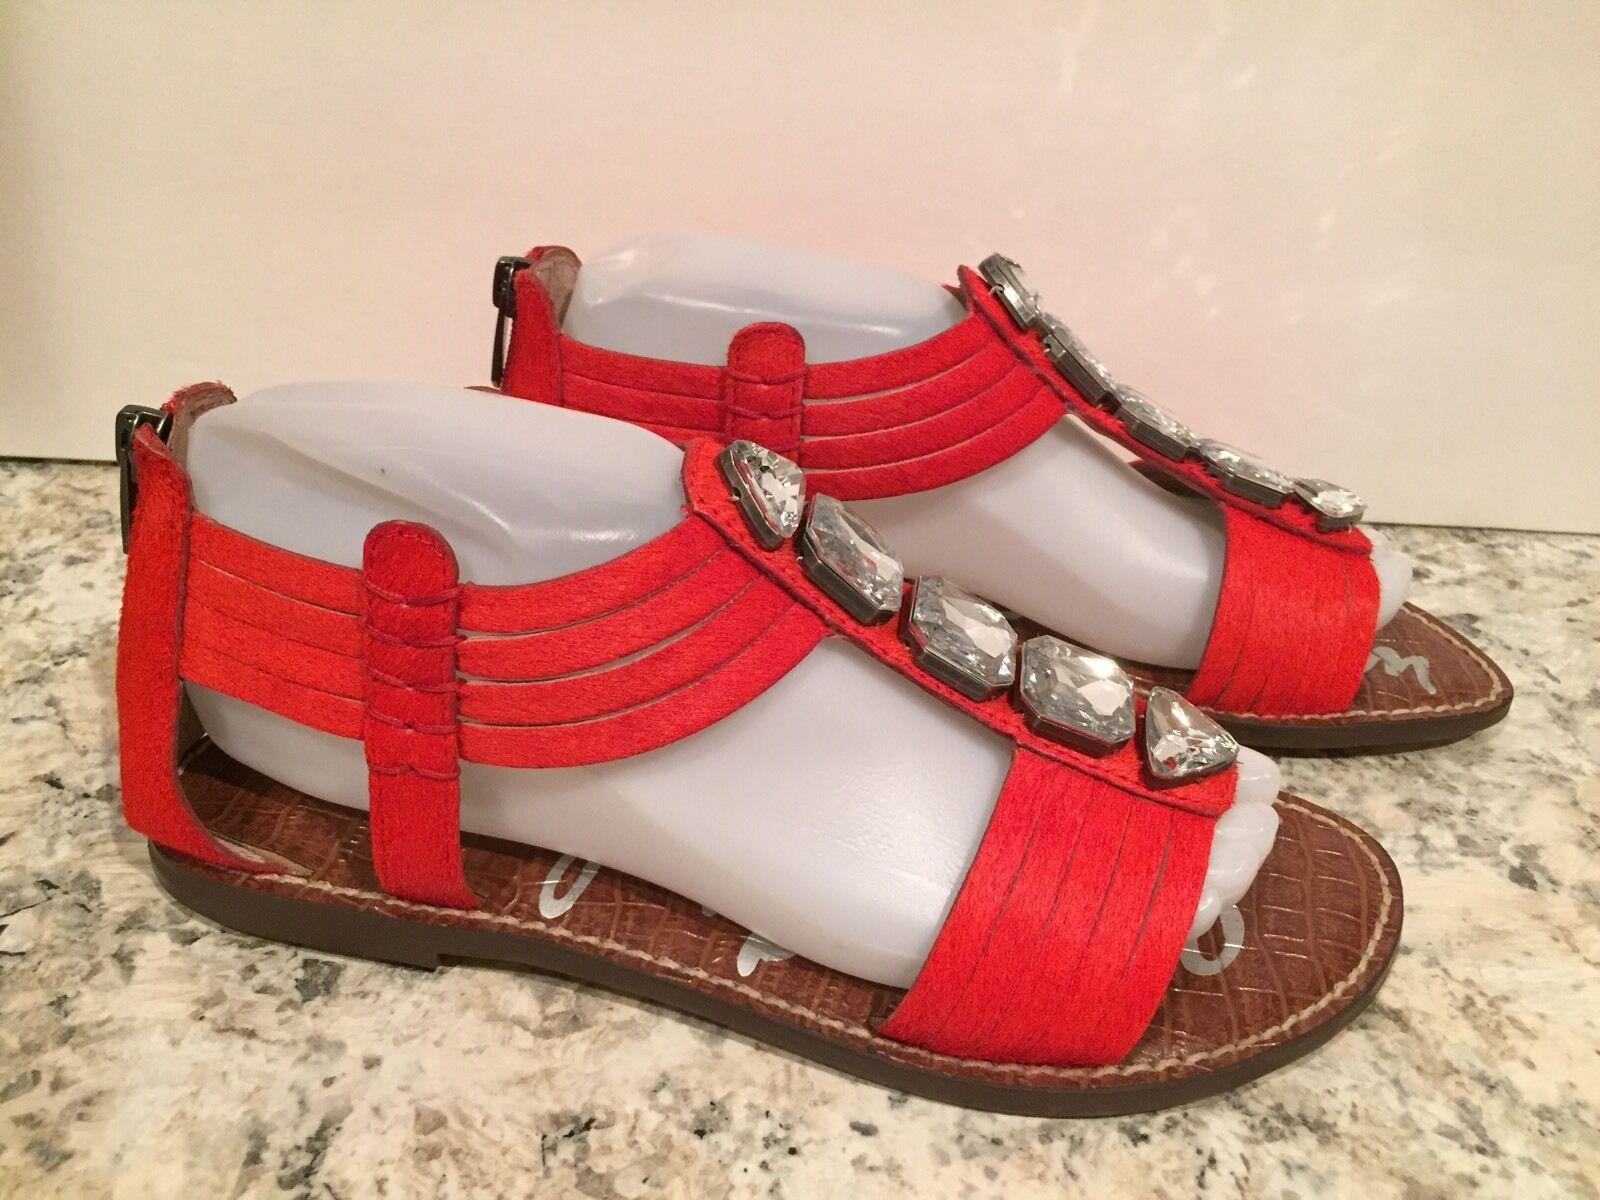 Sam Edelman Galina Sandals T-strap Jewelry Calf Hair Red-orange 8 M  150 New